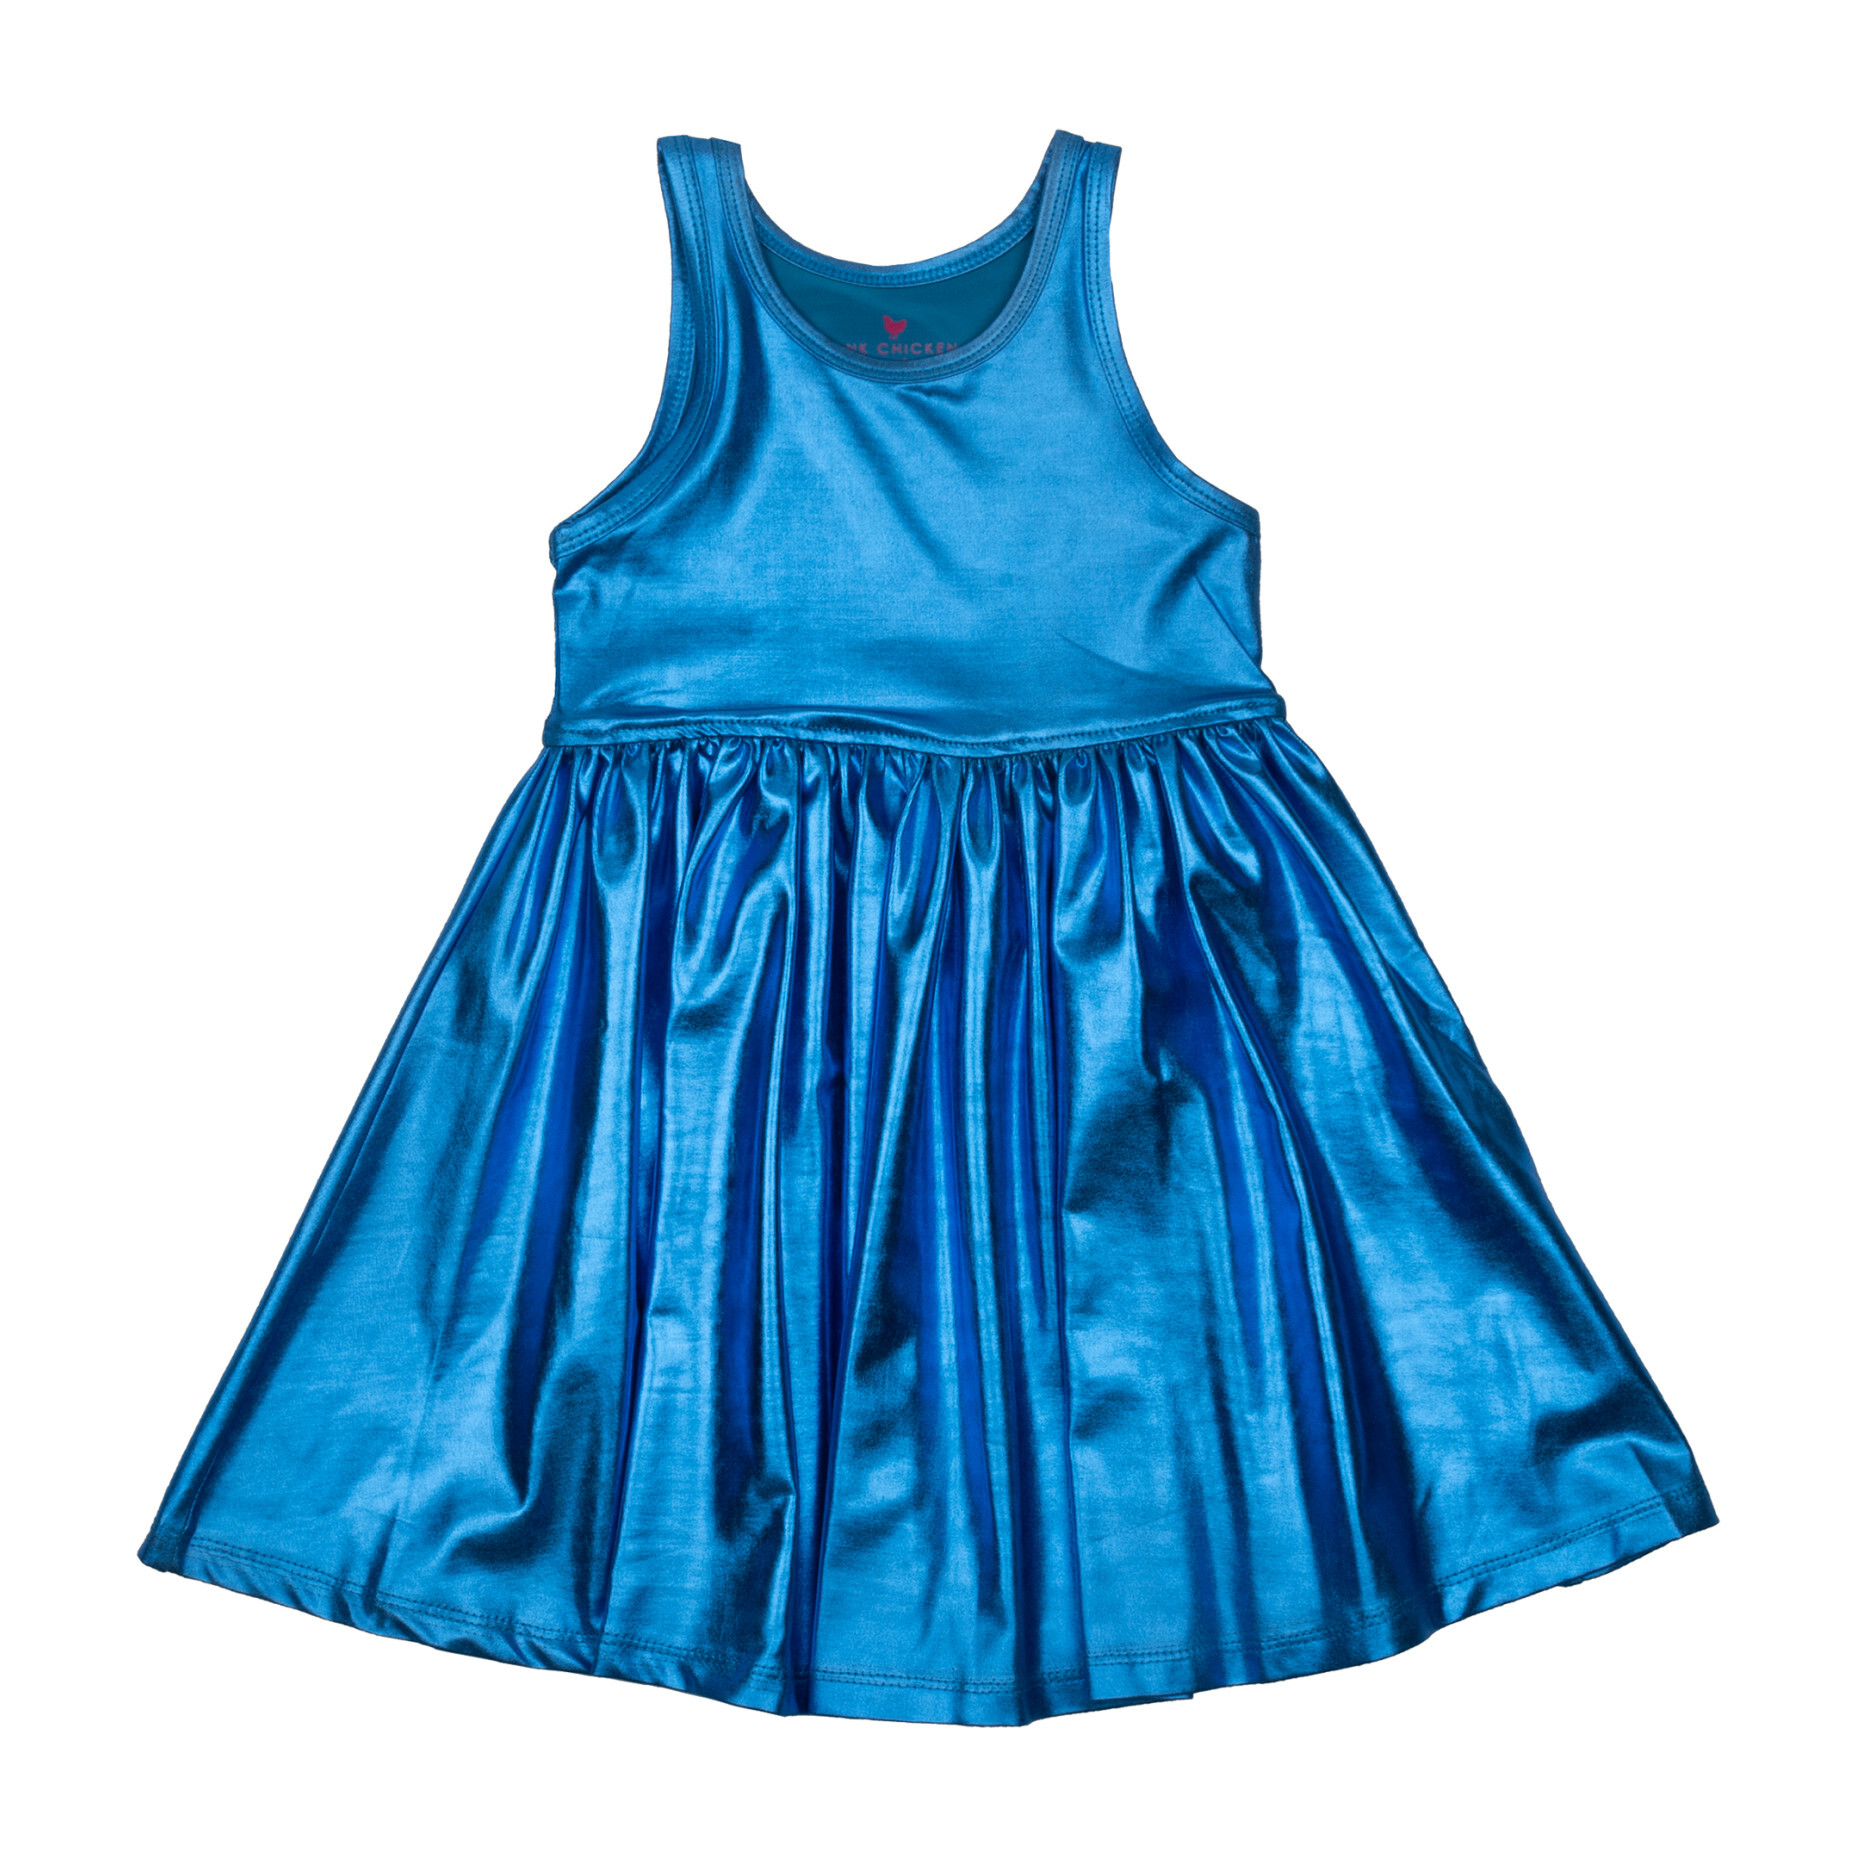 Liza Lame Dress, Blue Metallic